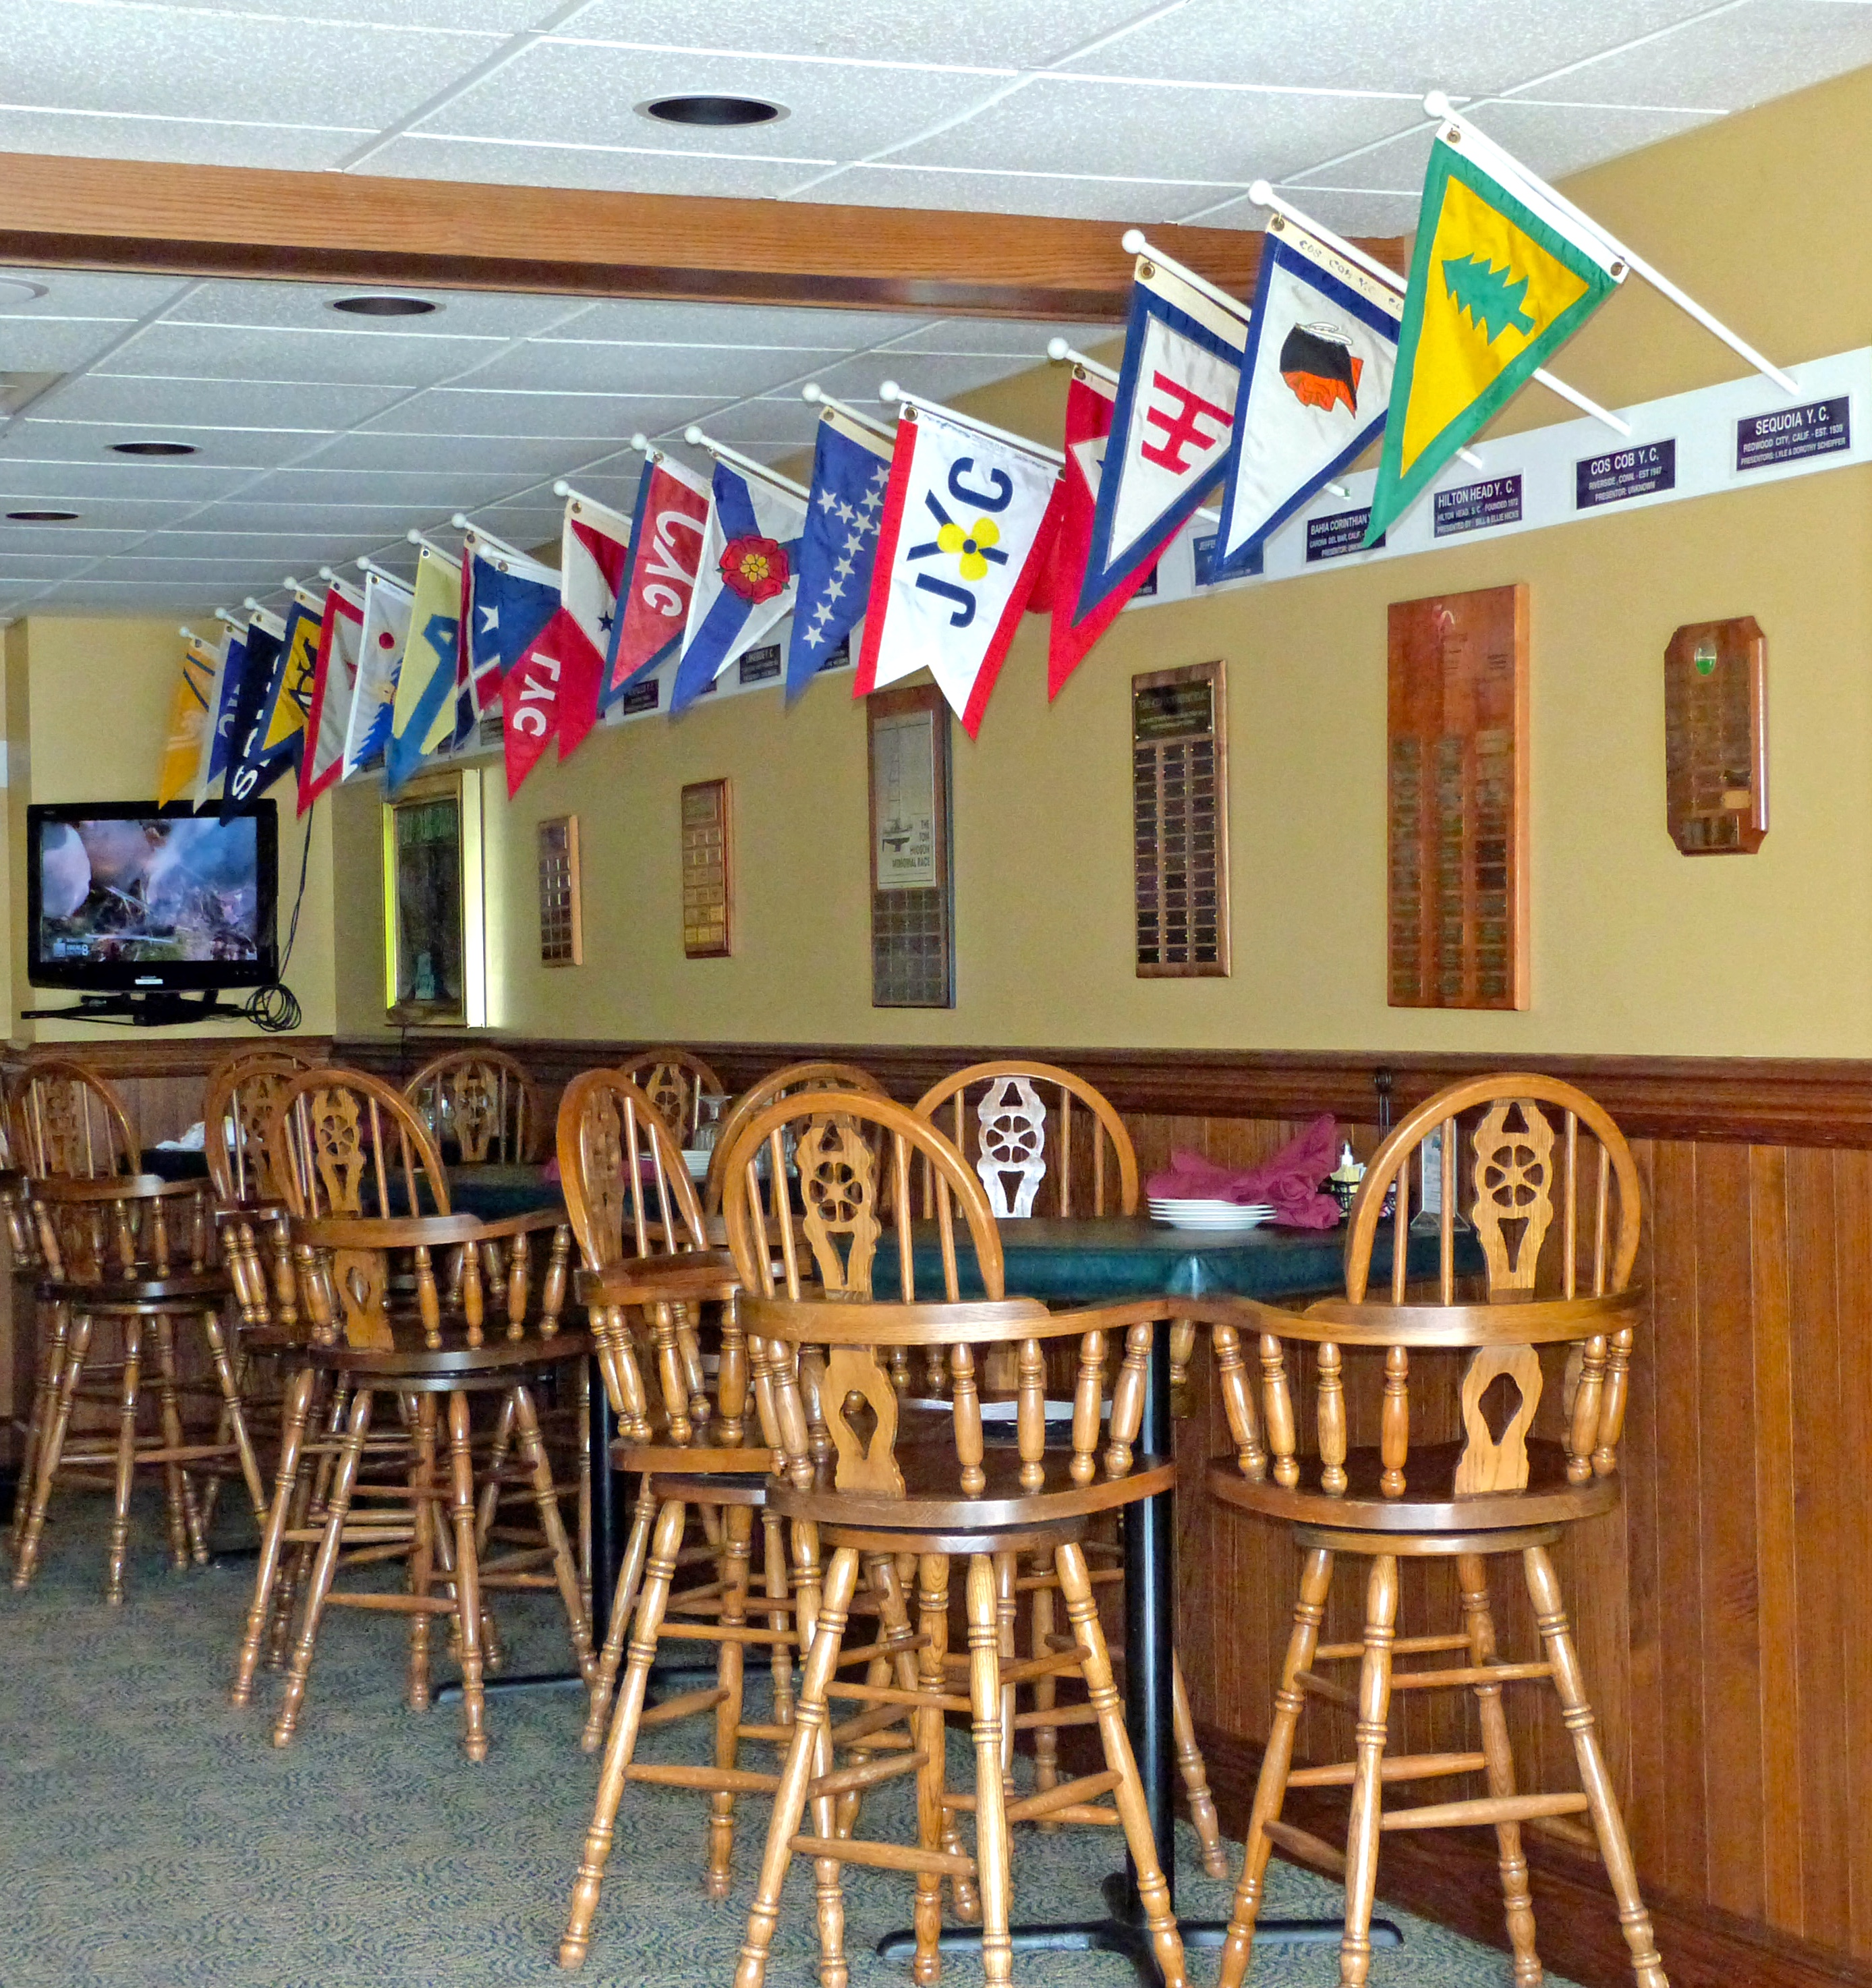 Yacht Club Beer: Ohio-Atwood Yacht Club